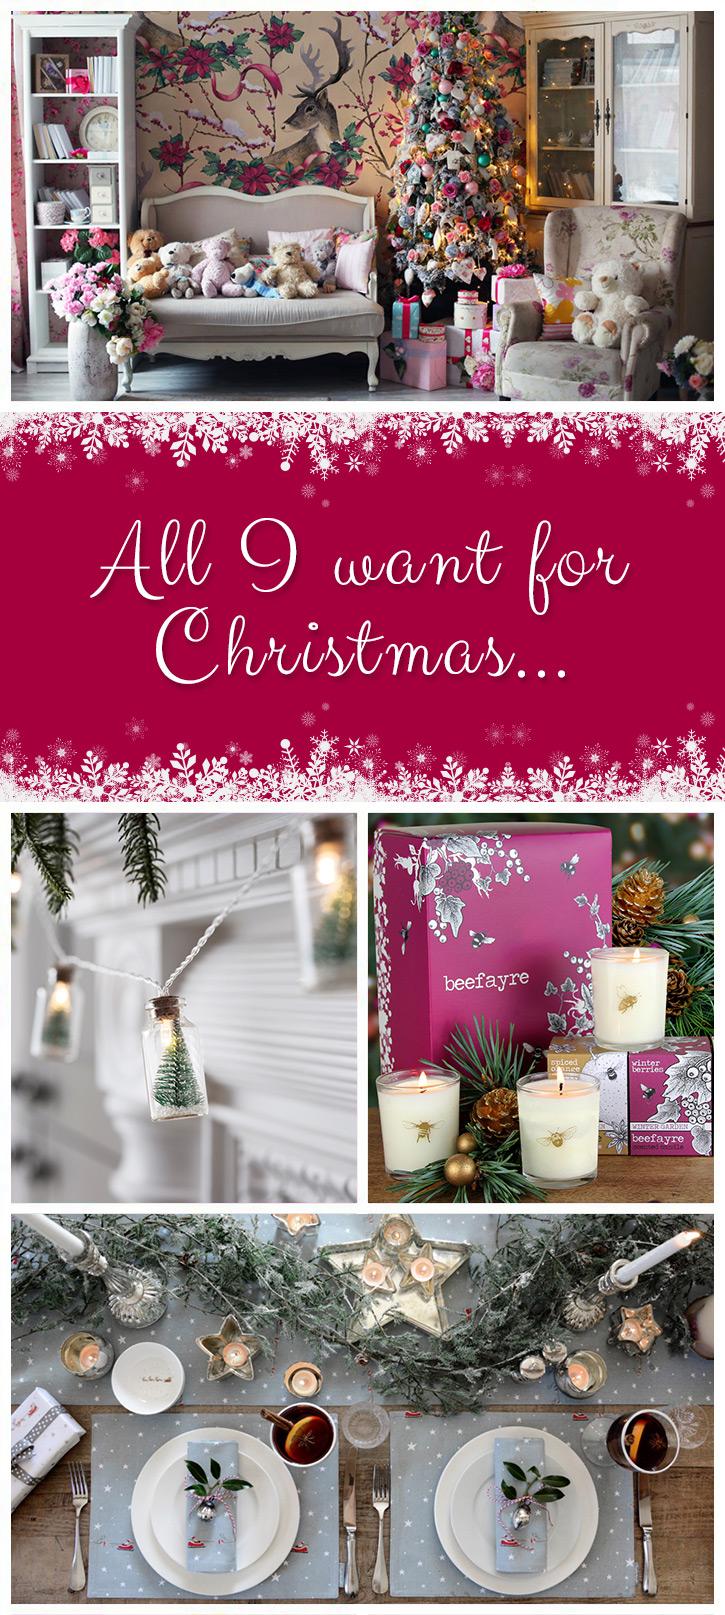 infographic on Christmas decor ideas